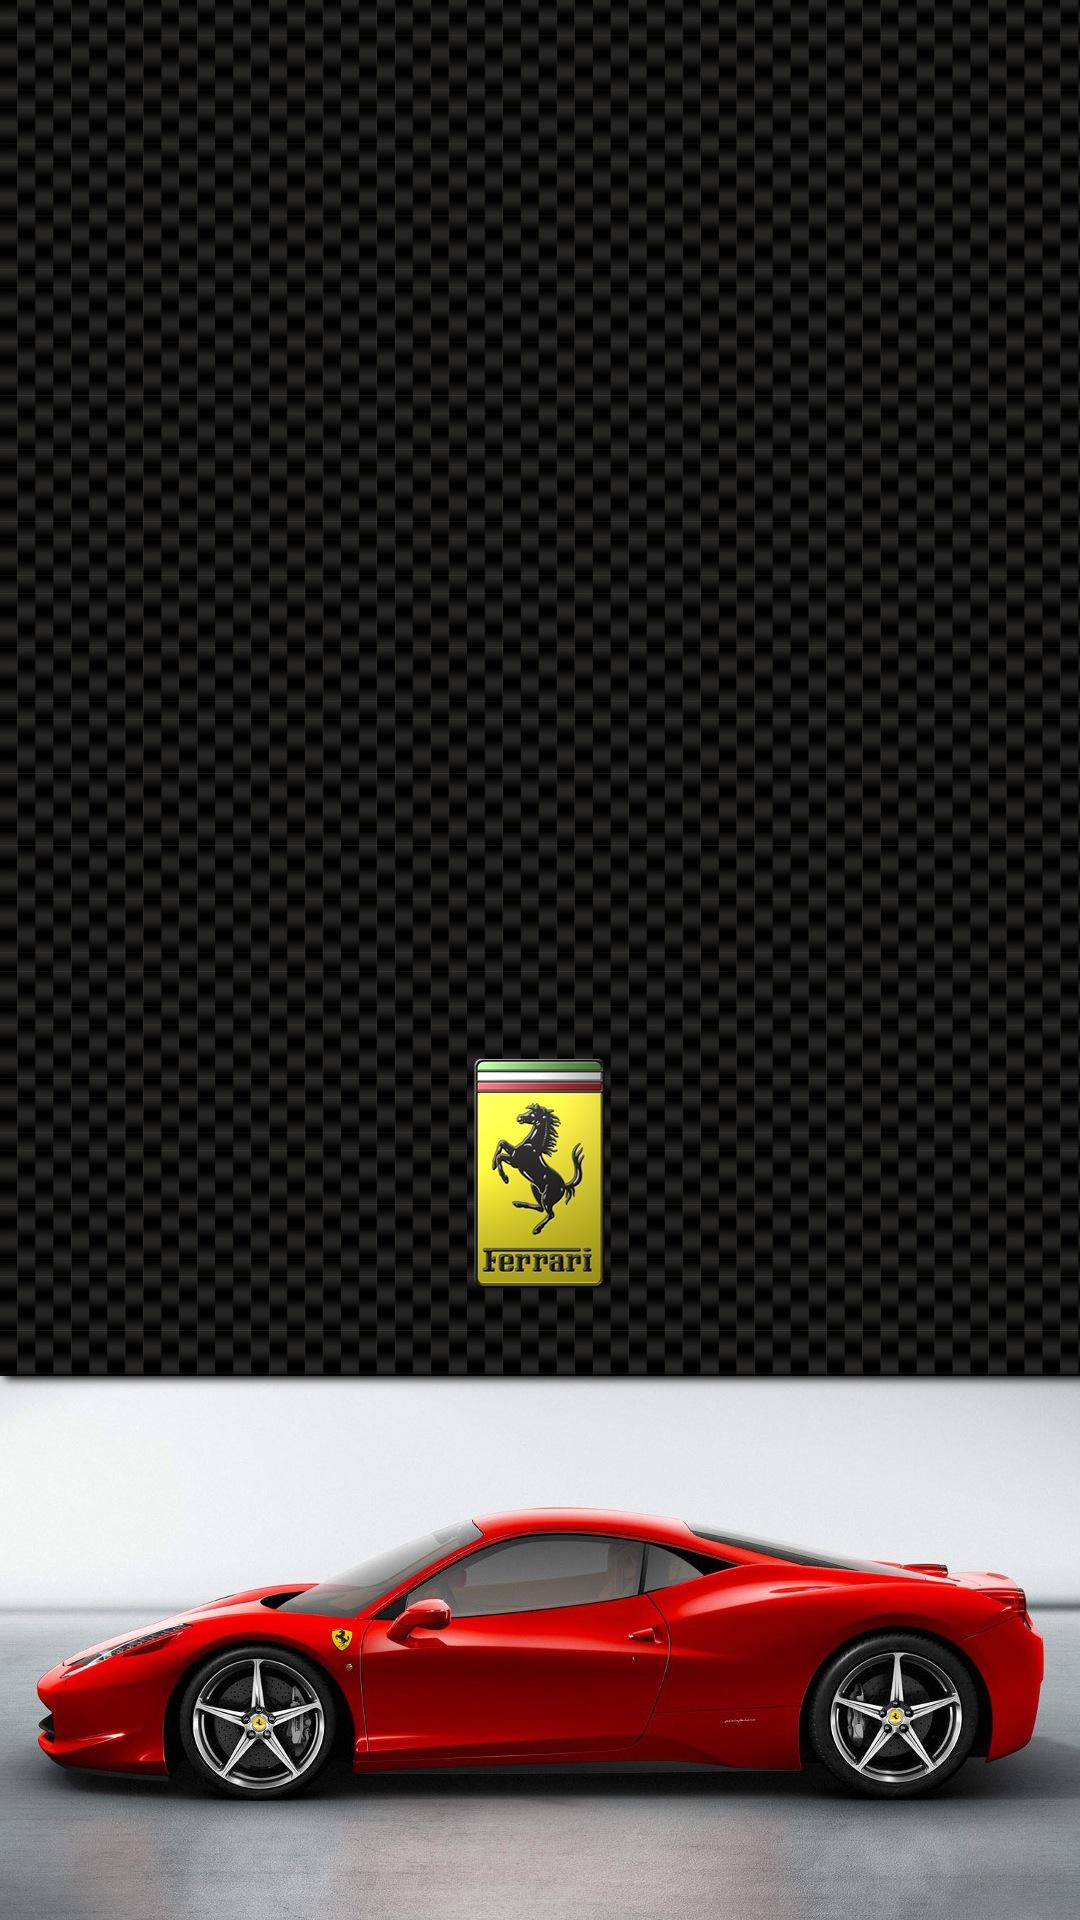 Download Android Lock Screen Wallpaper Wallpaper Full Hd 1080x1920